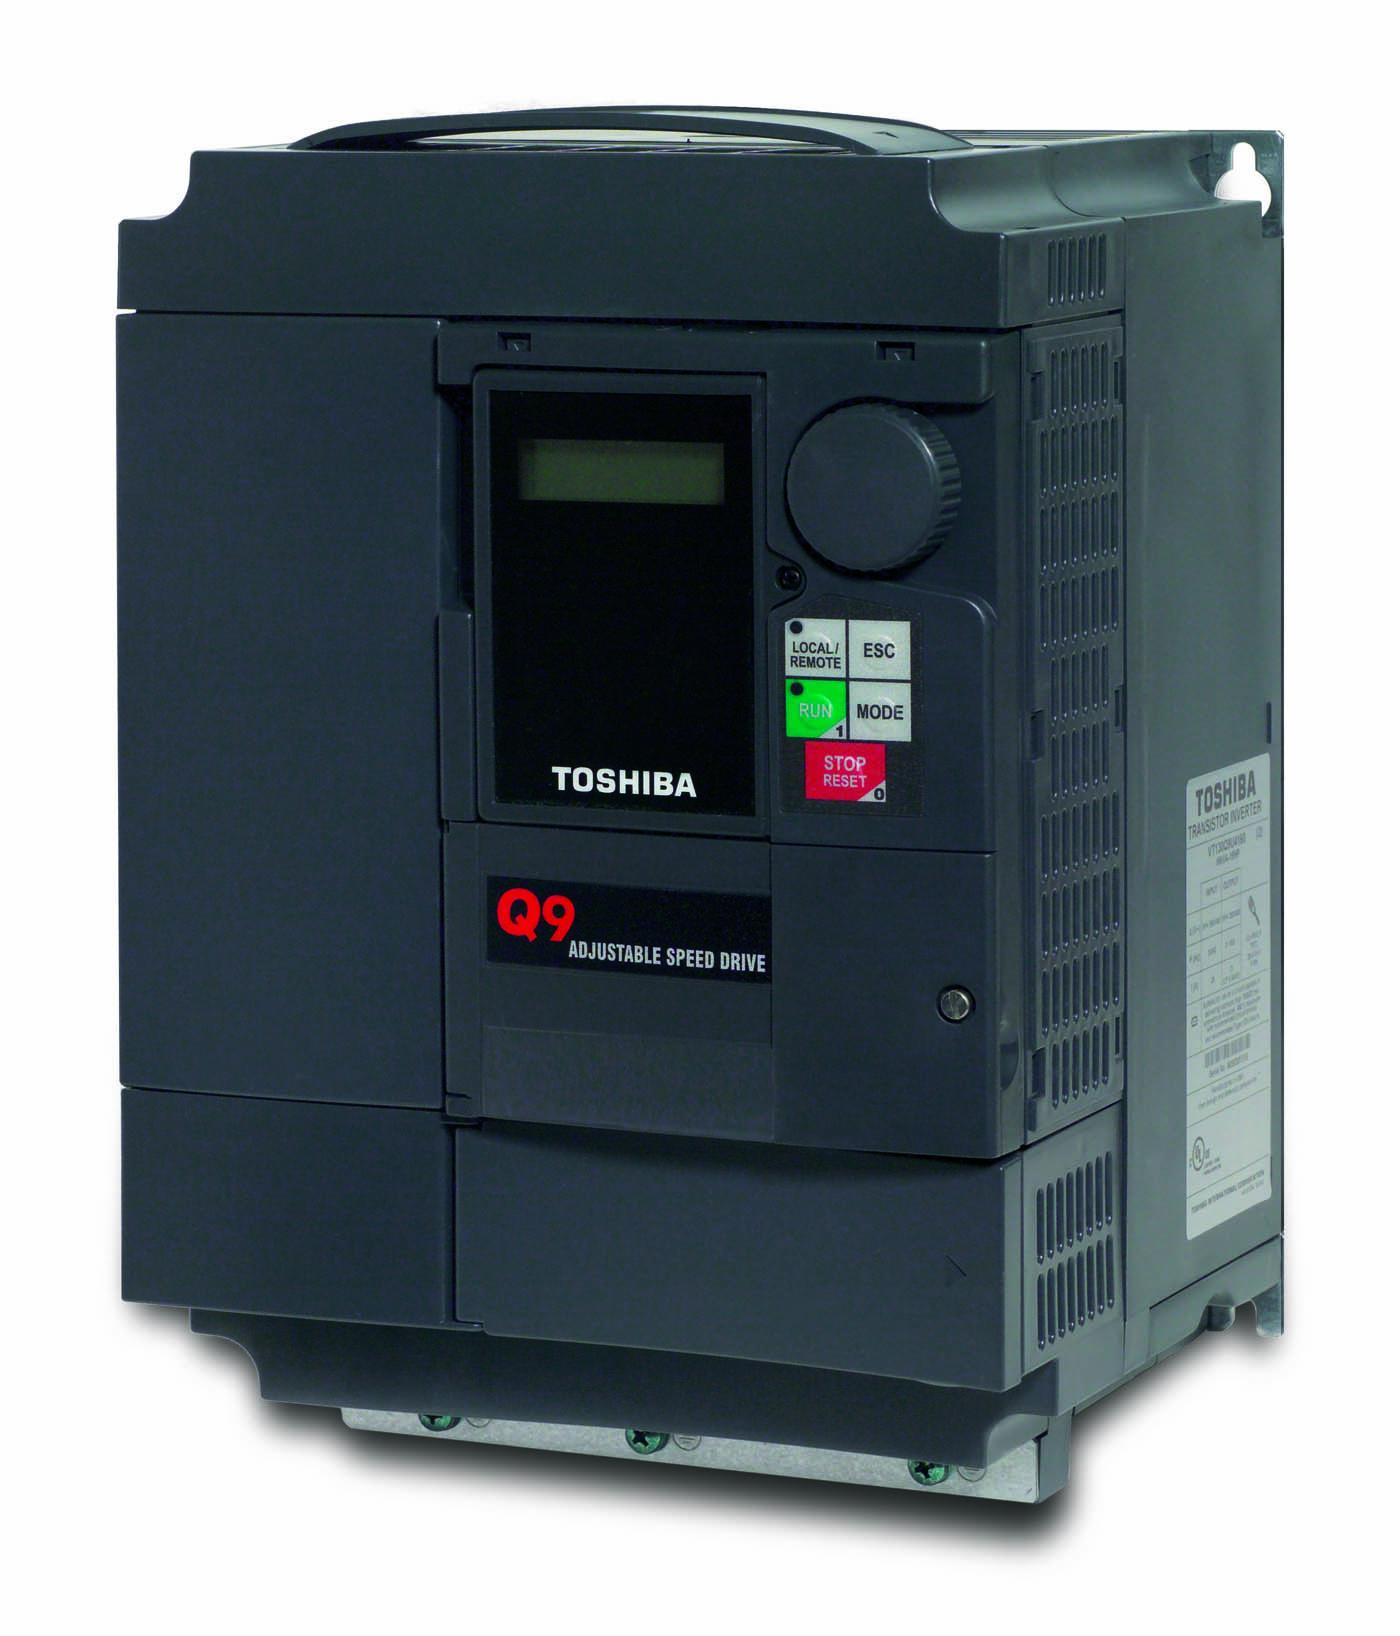 Q9 Hvac Motors Drives Toshiba International Corporation Toshiba Q9 Wiring  Diagram